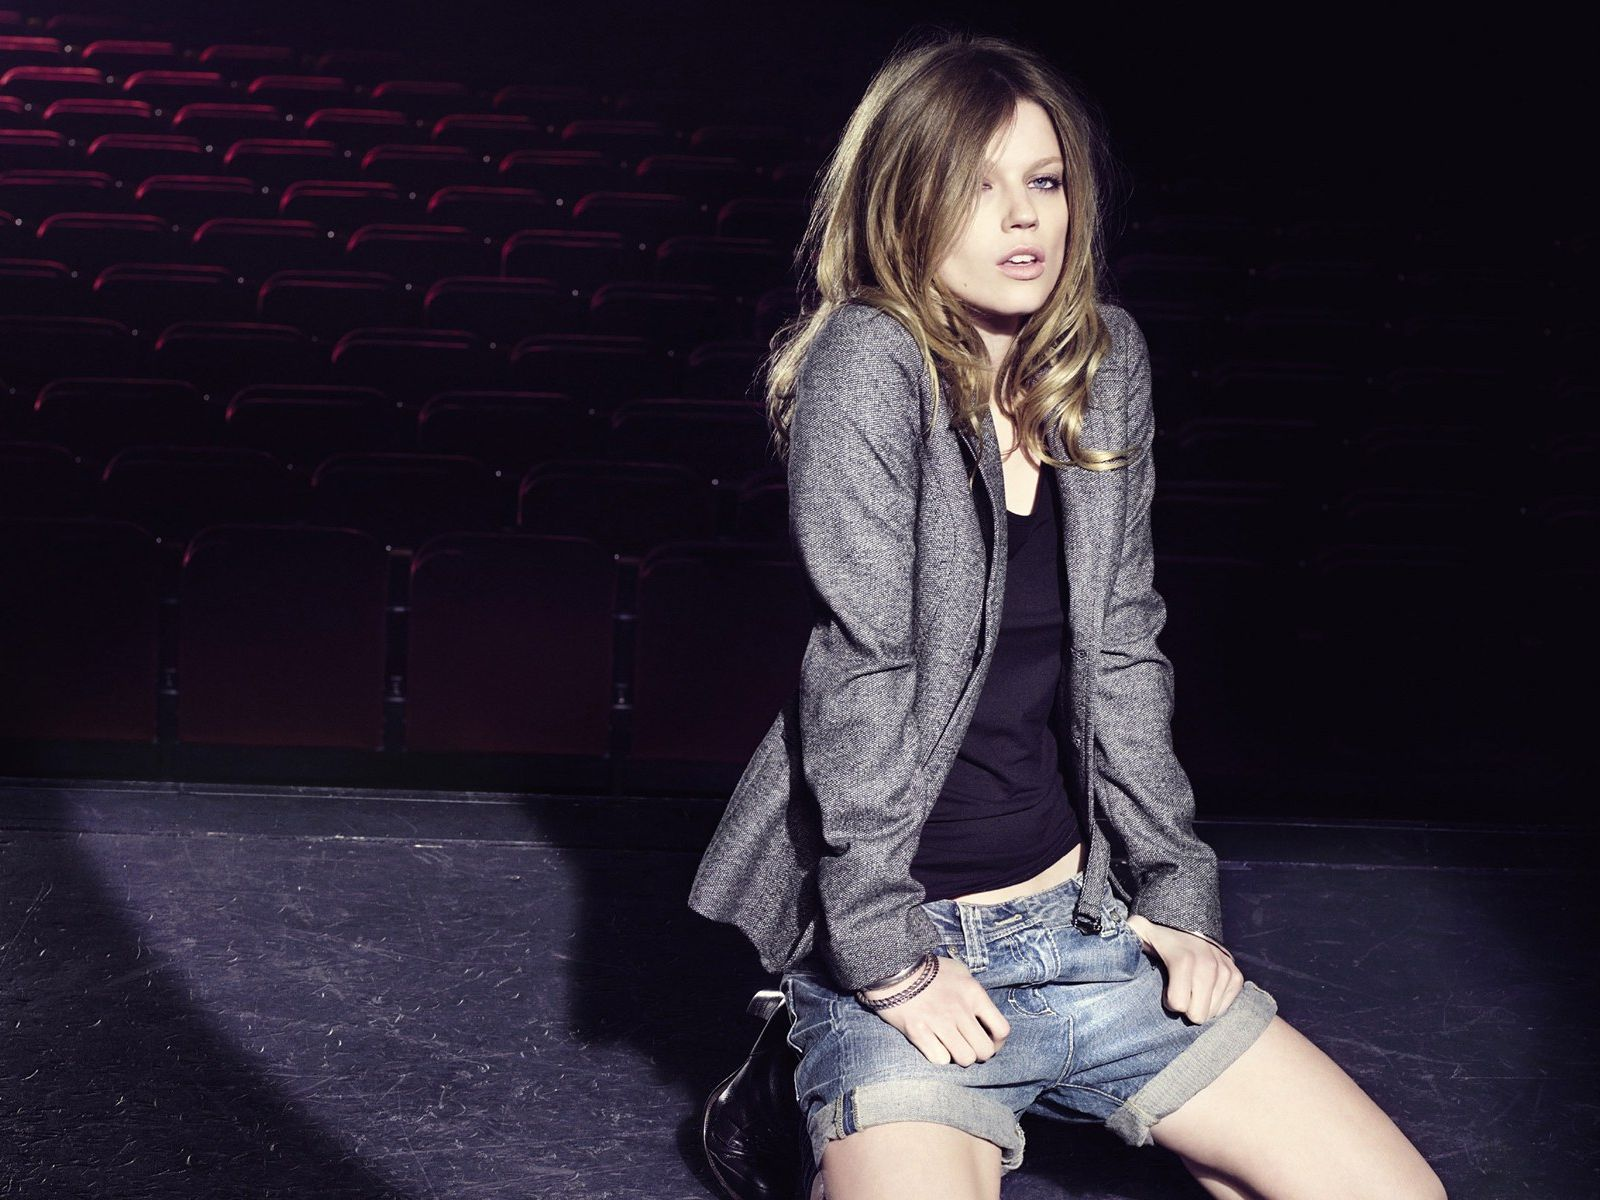 Grey,patterned Jacket Blue Jeans Shorts